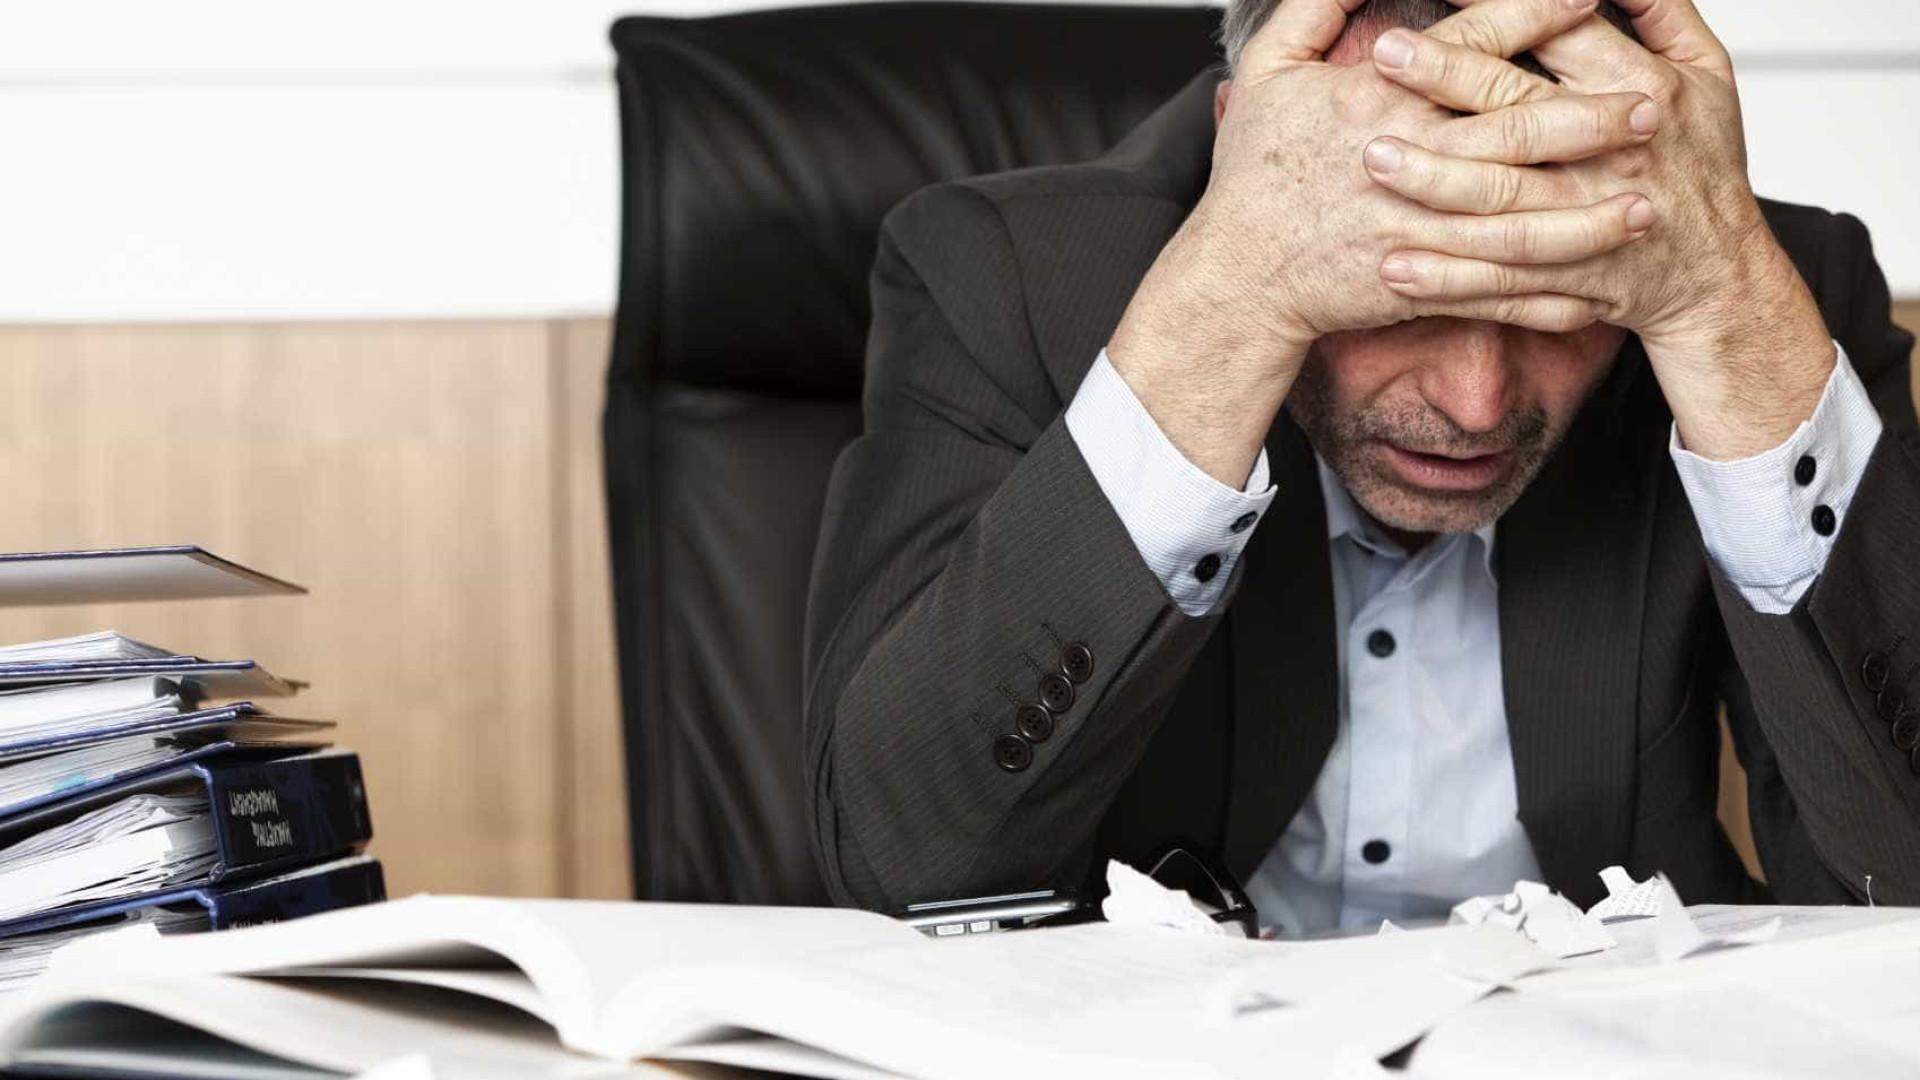 Estresse leva a infarto, aponta pesquisa de Harvard